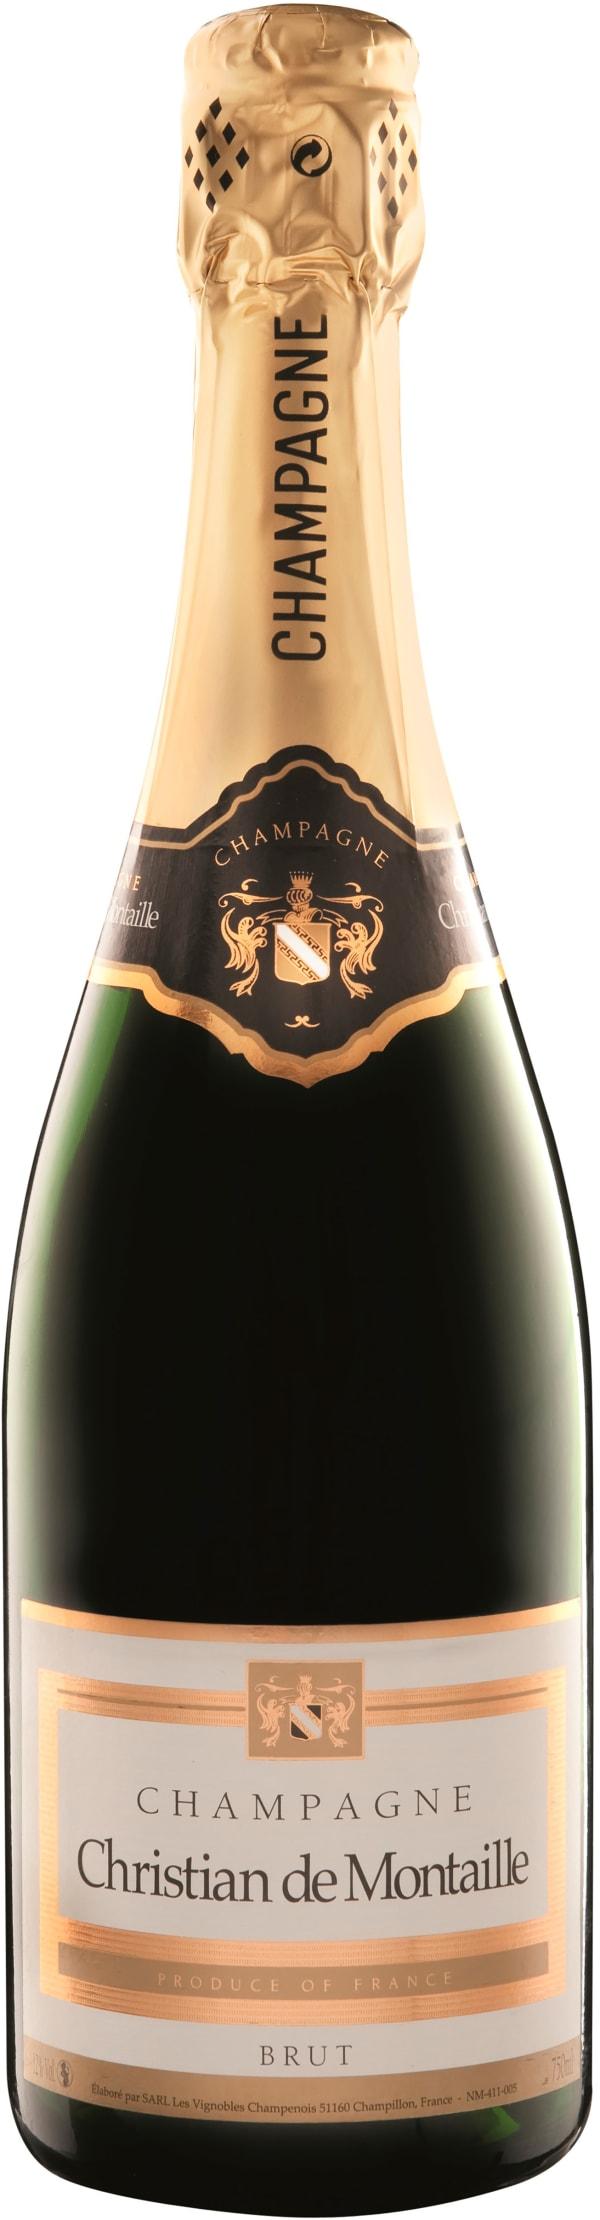 Christian de Montaille Champagne Brut